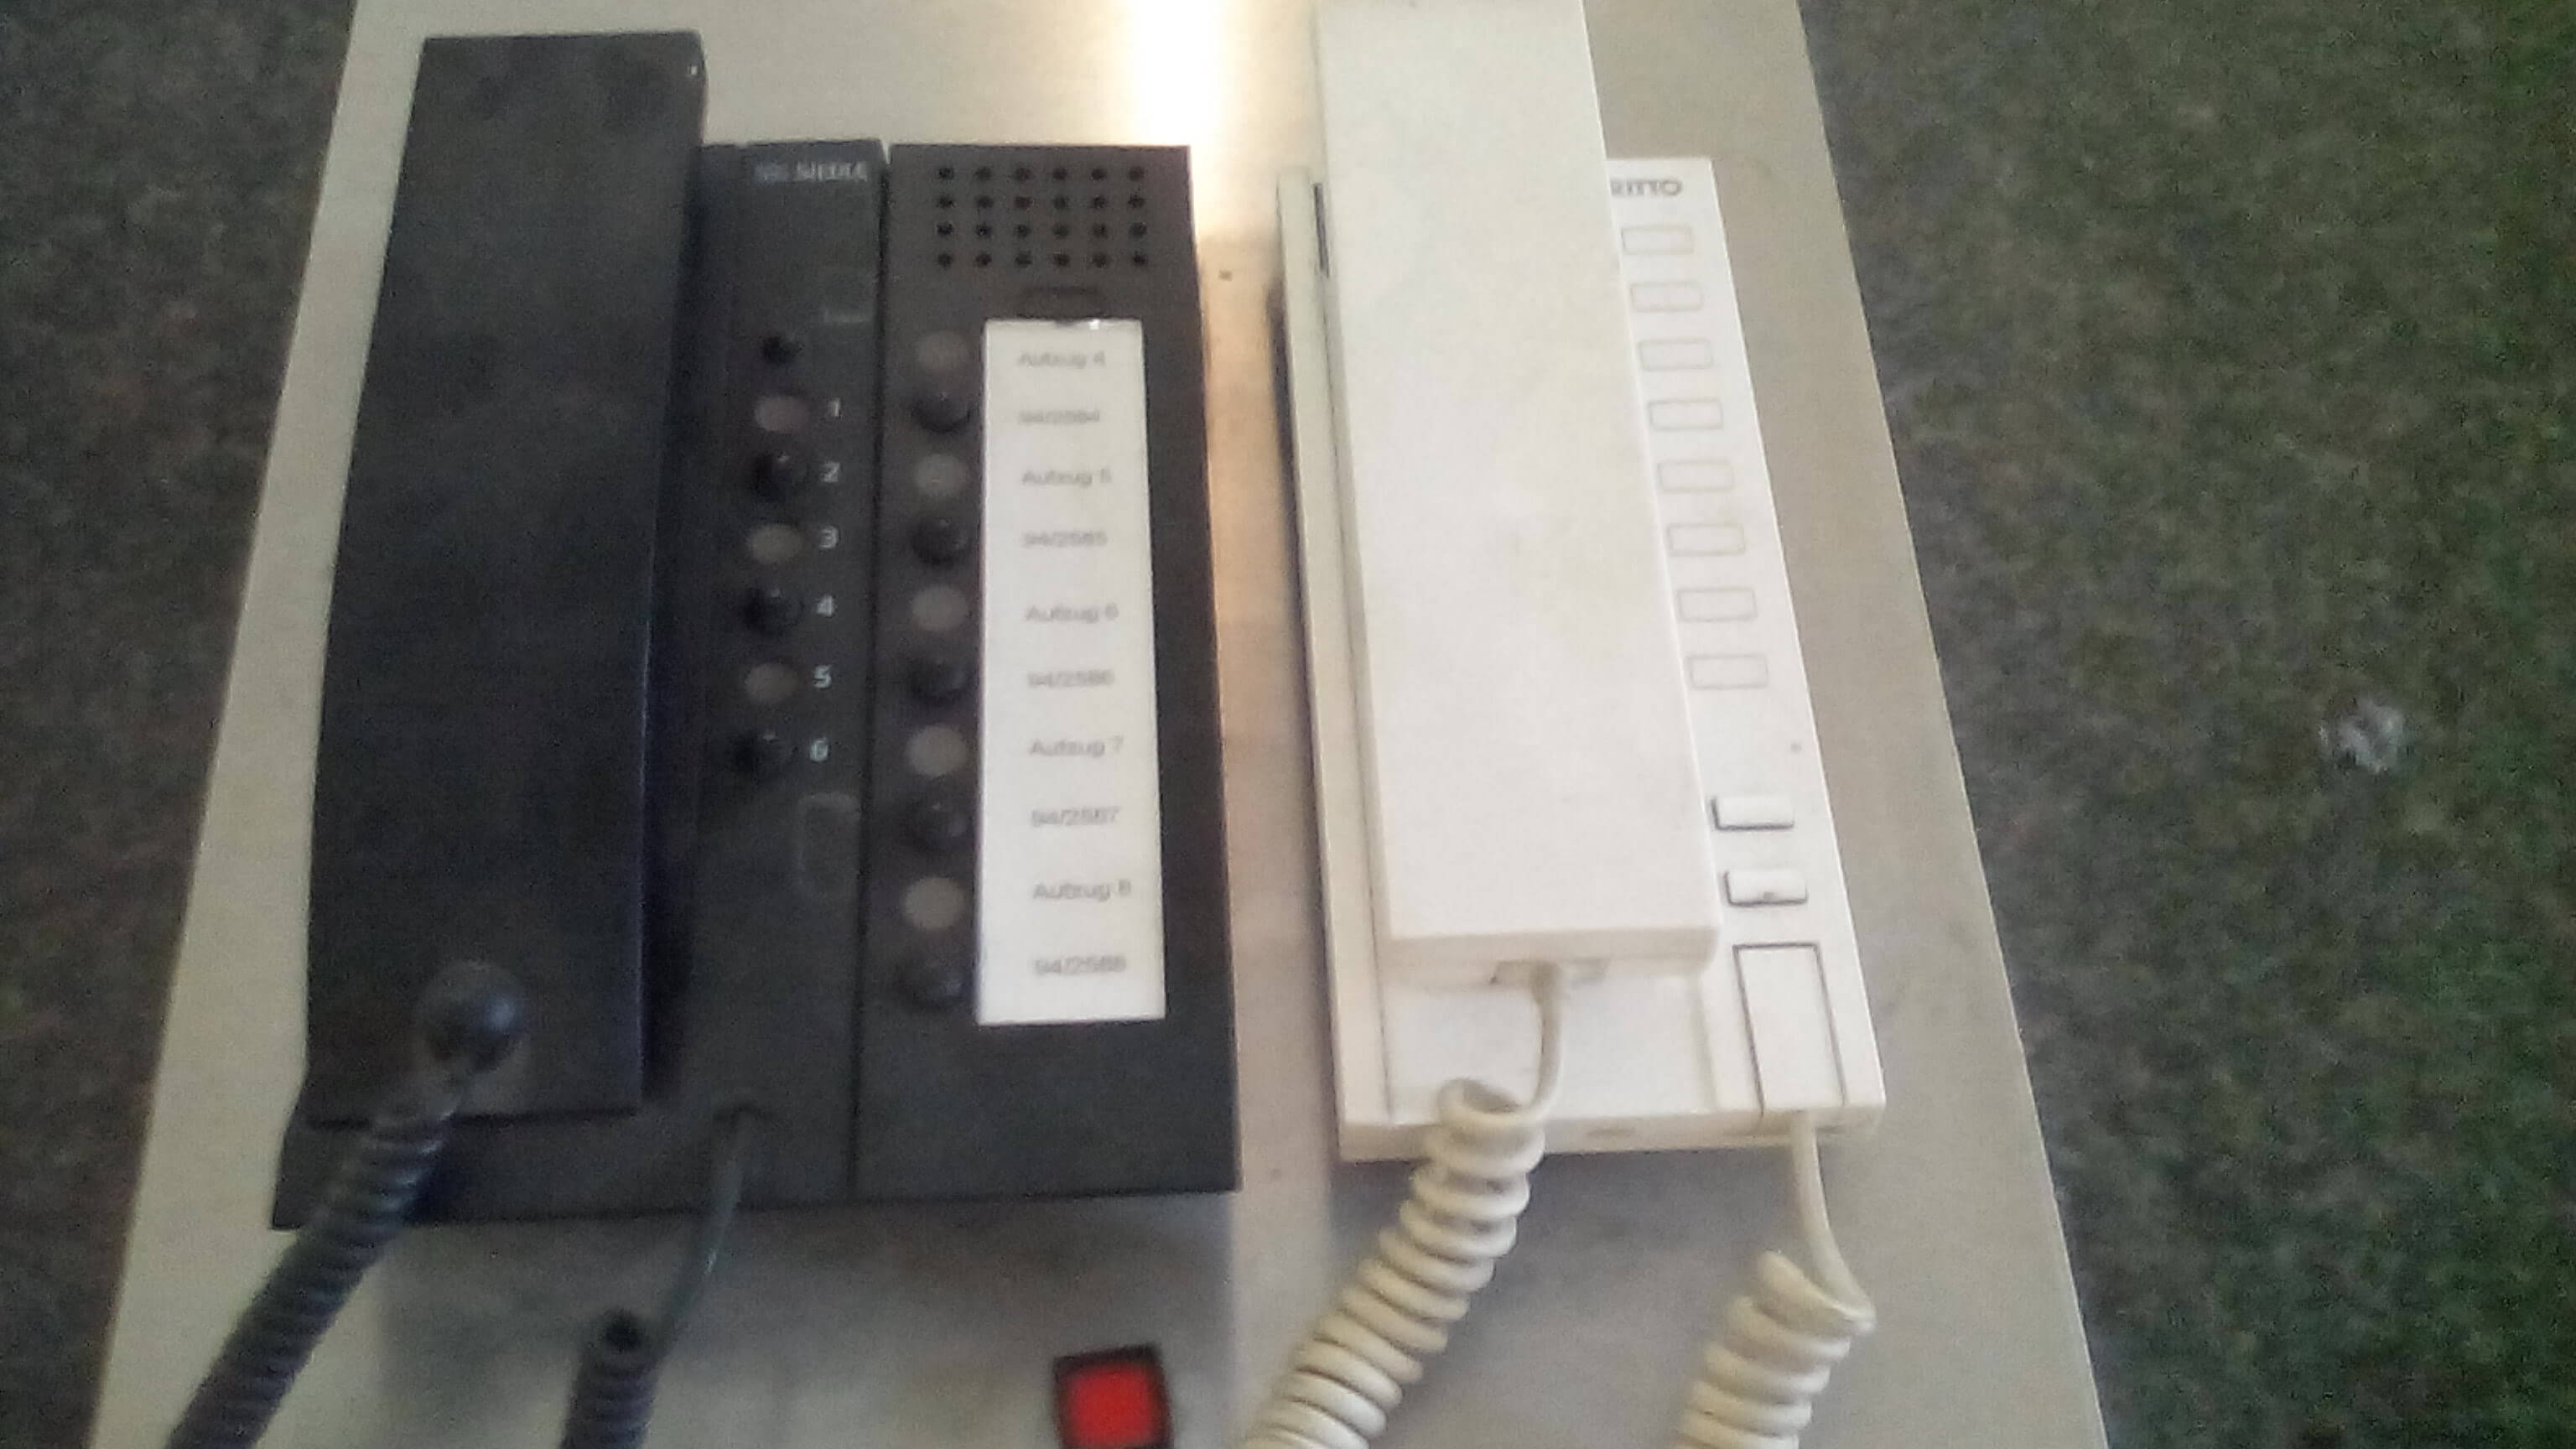 Telefone (c) familienfreund.de